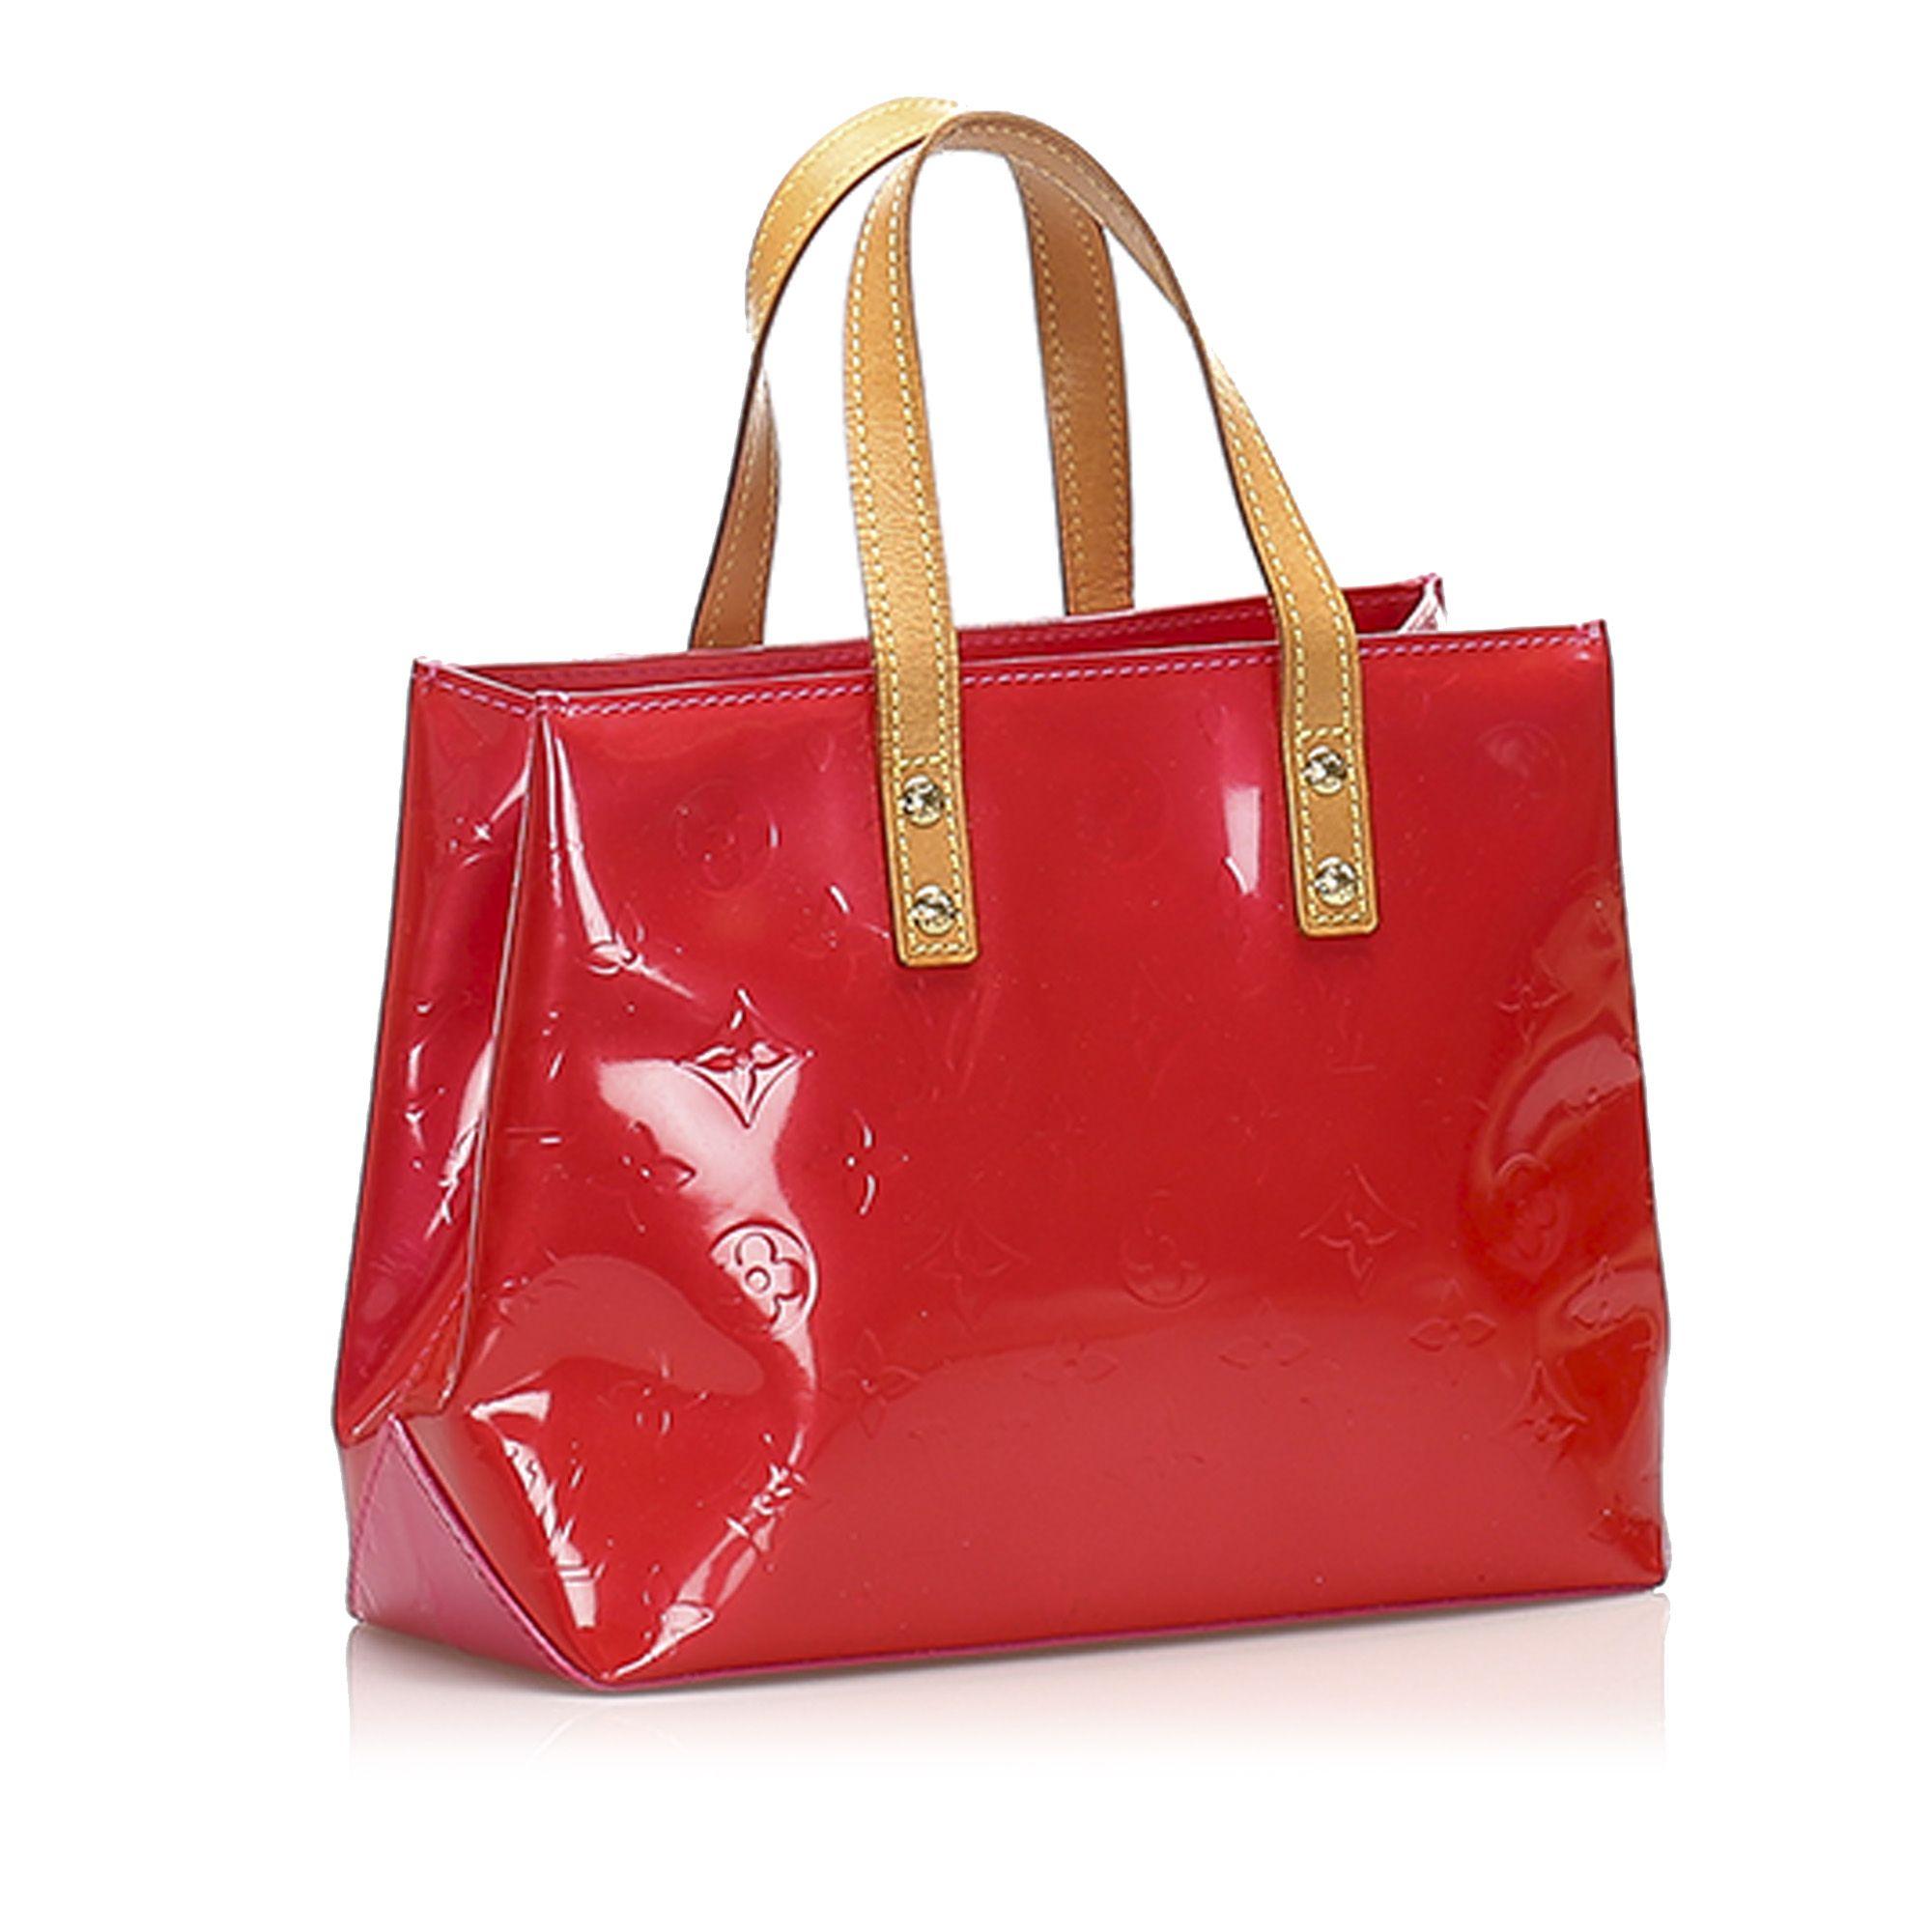 Vintage Louis Vuitton Vernis Reade PM Red